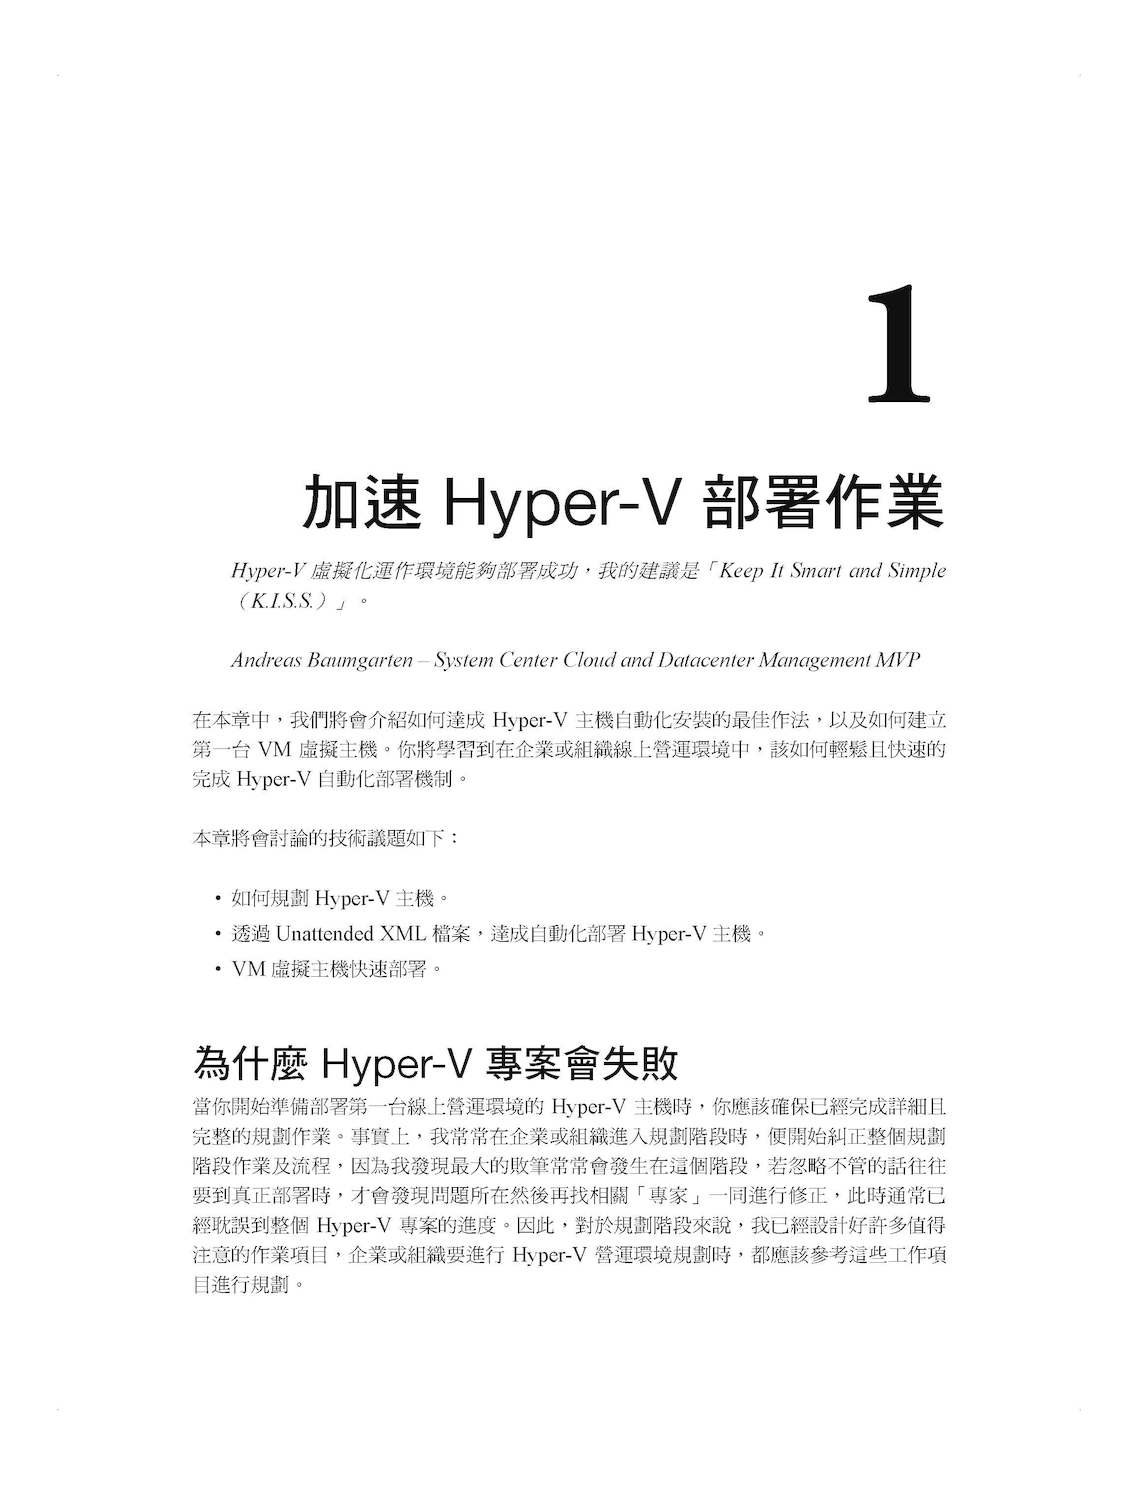 Hyper-V 最佳實踐:快速建置虛擬化解決方案 (Hyper-V Best Practices)-preview-1